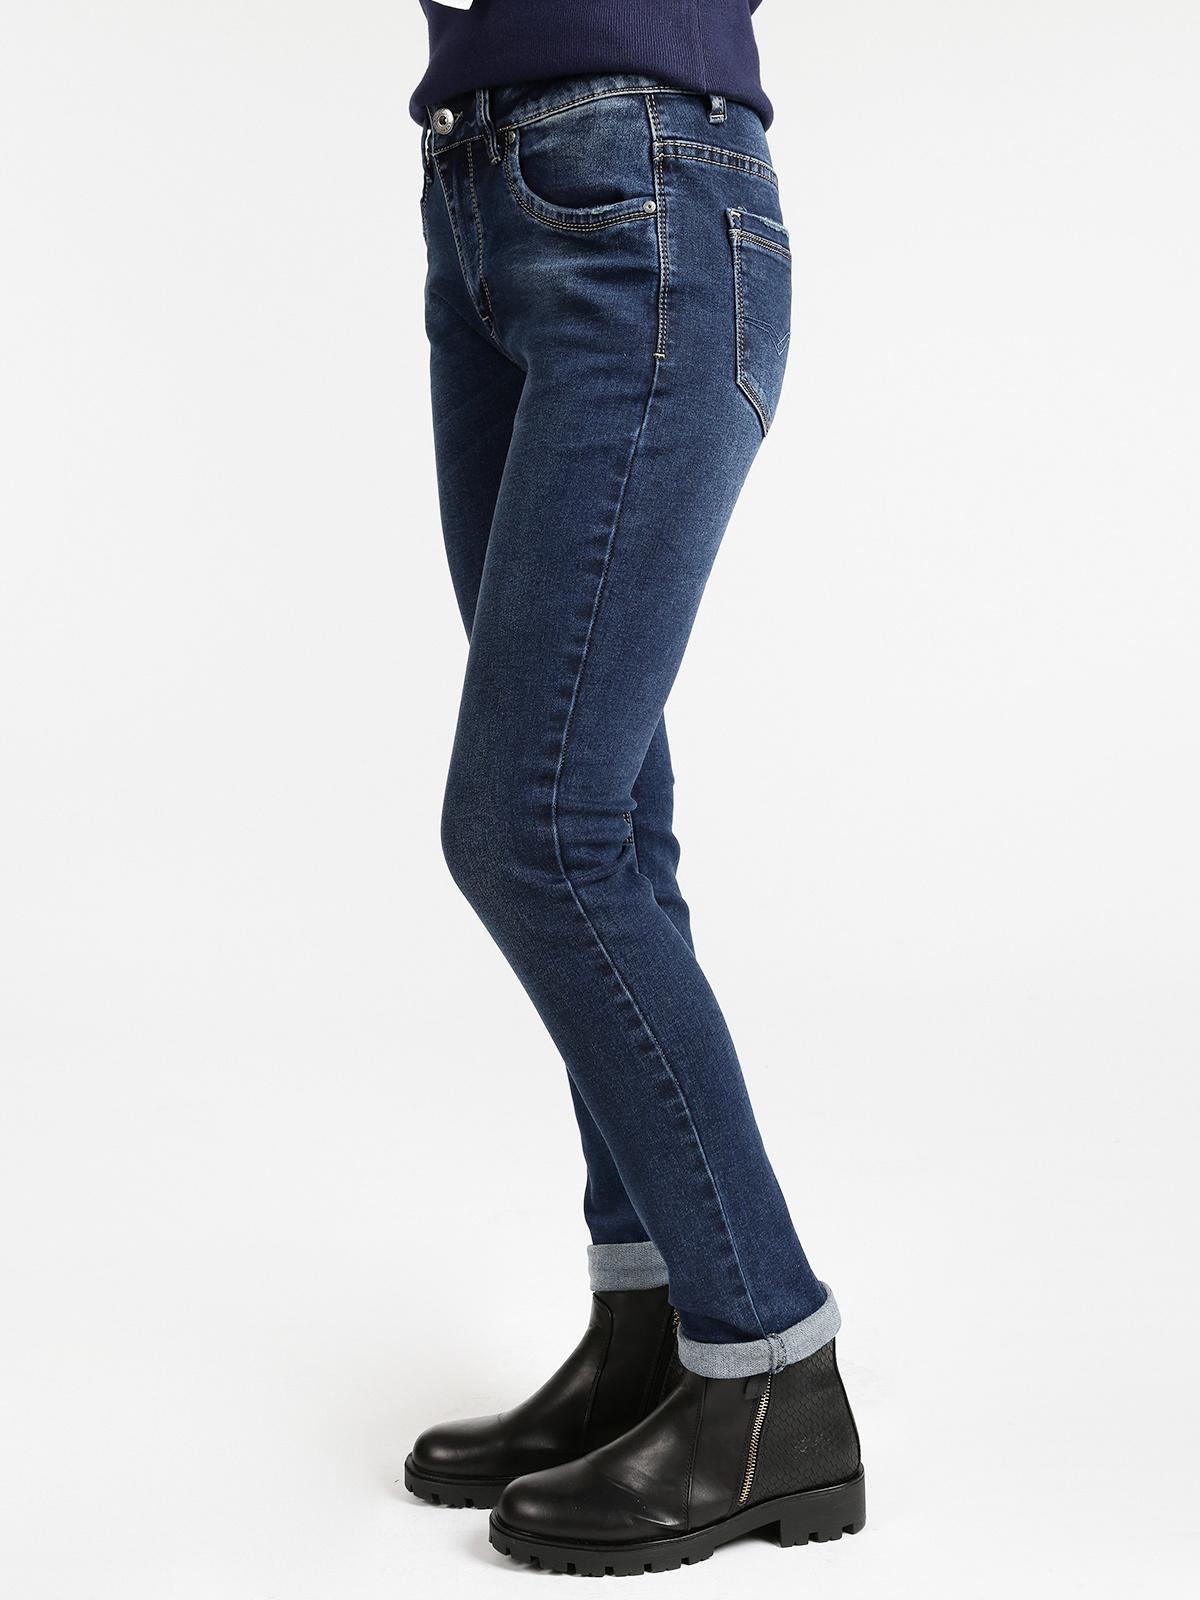 325d7231eb45 Jeans elásticos mujer   MecShopping